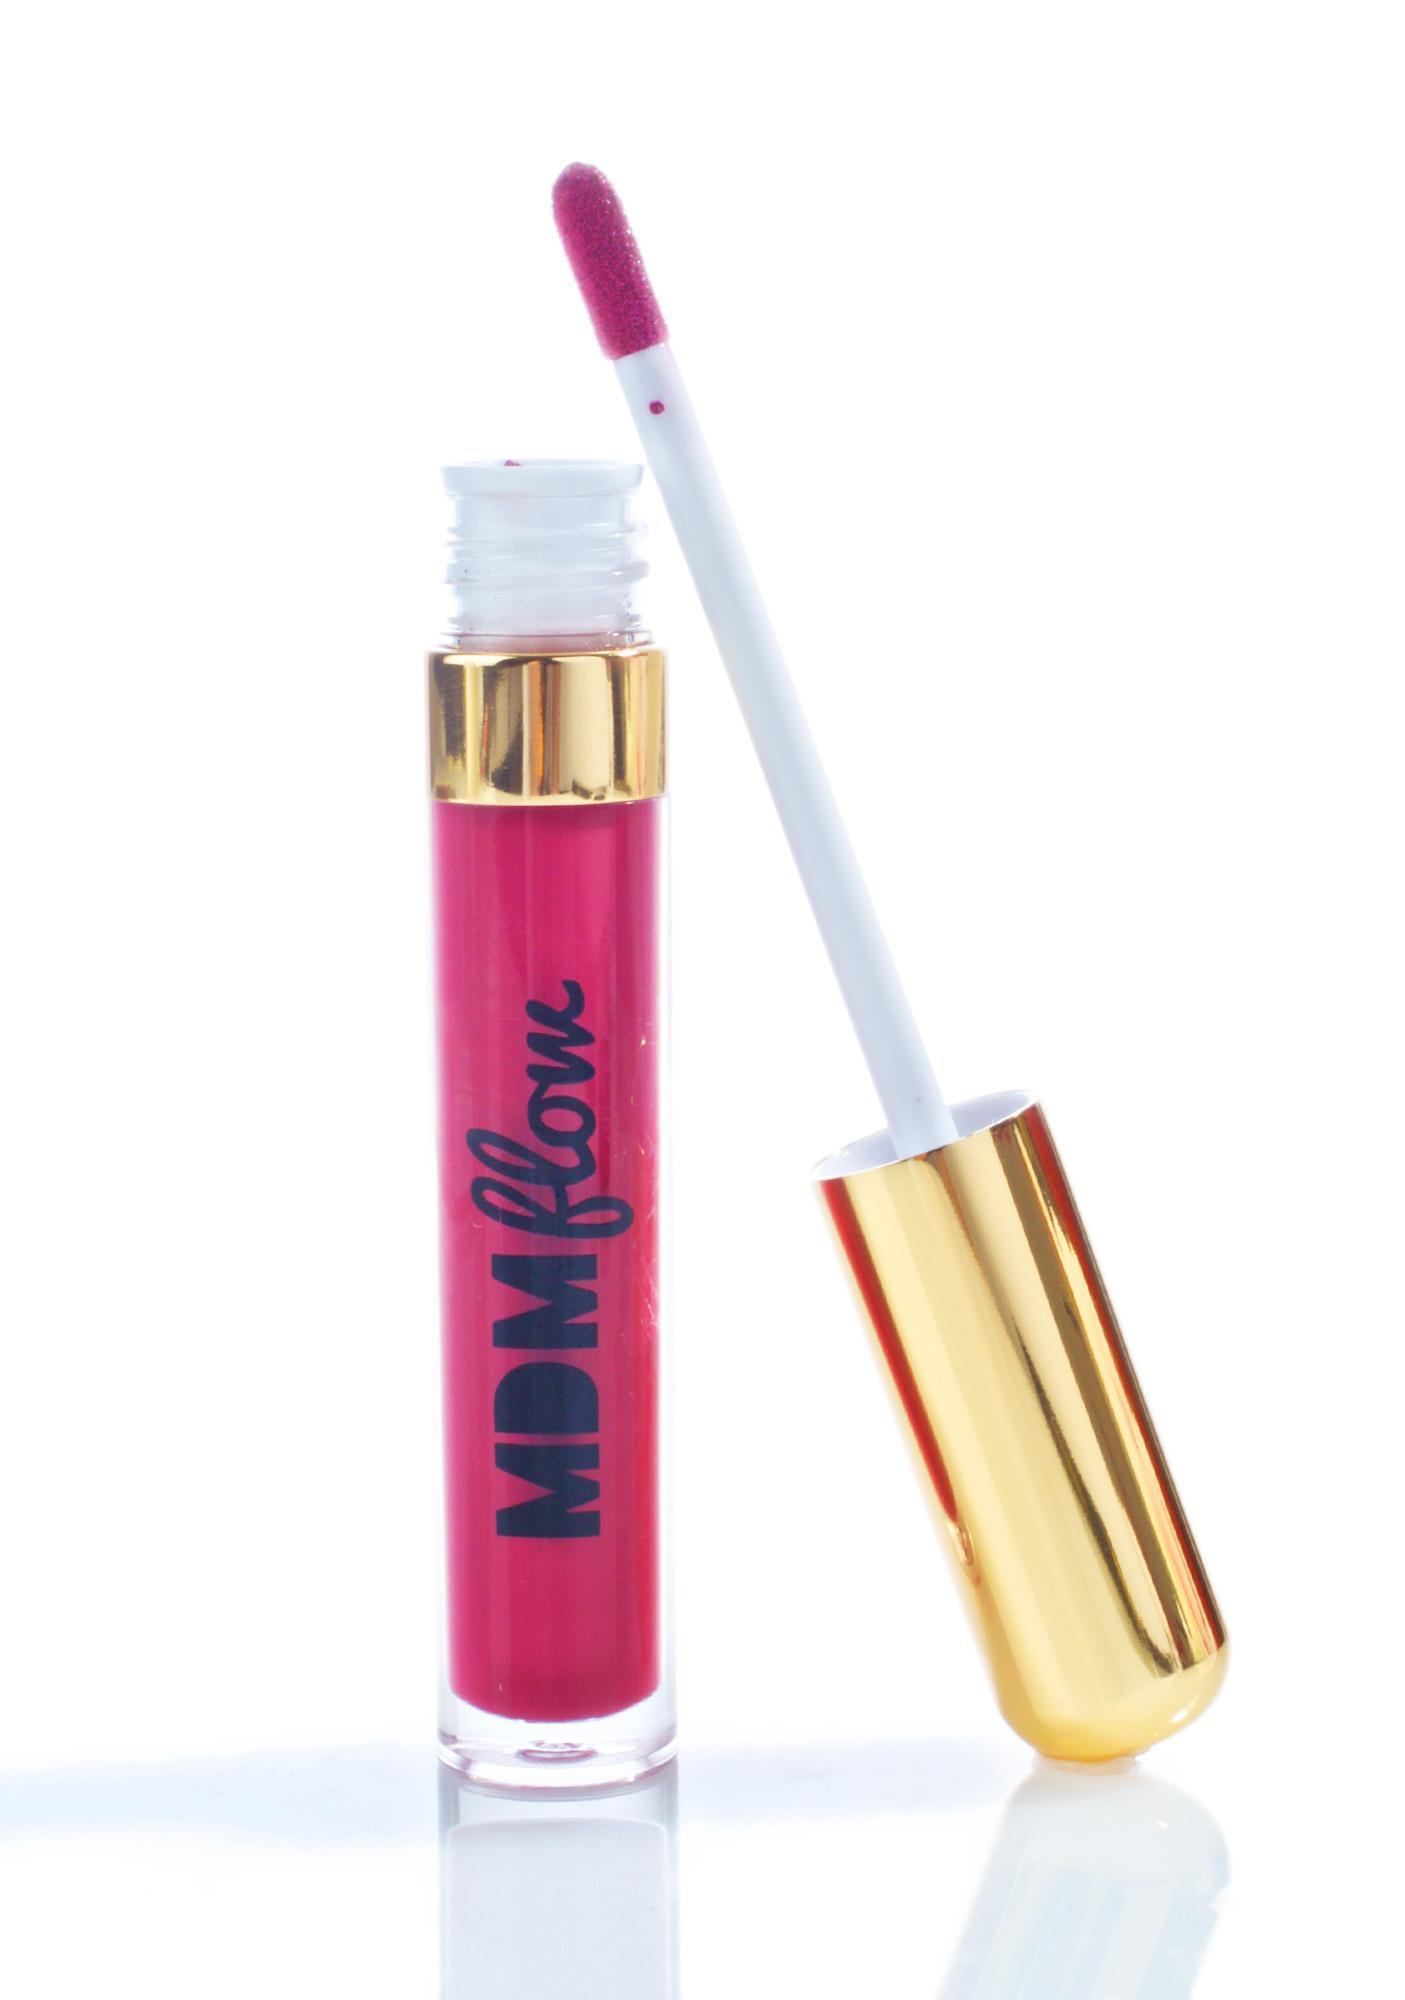 MDMflow Empire State Liquid Matte Lipstick